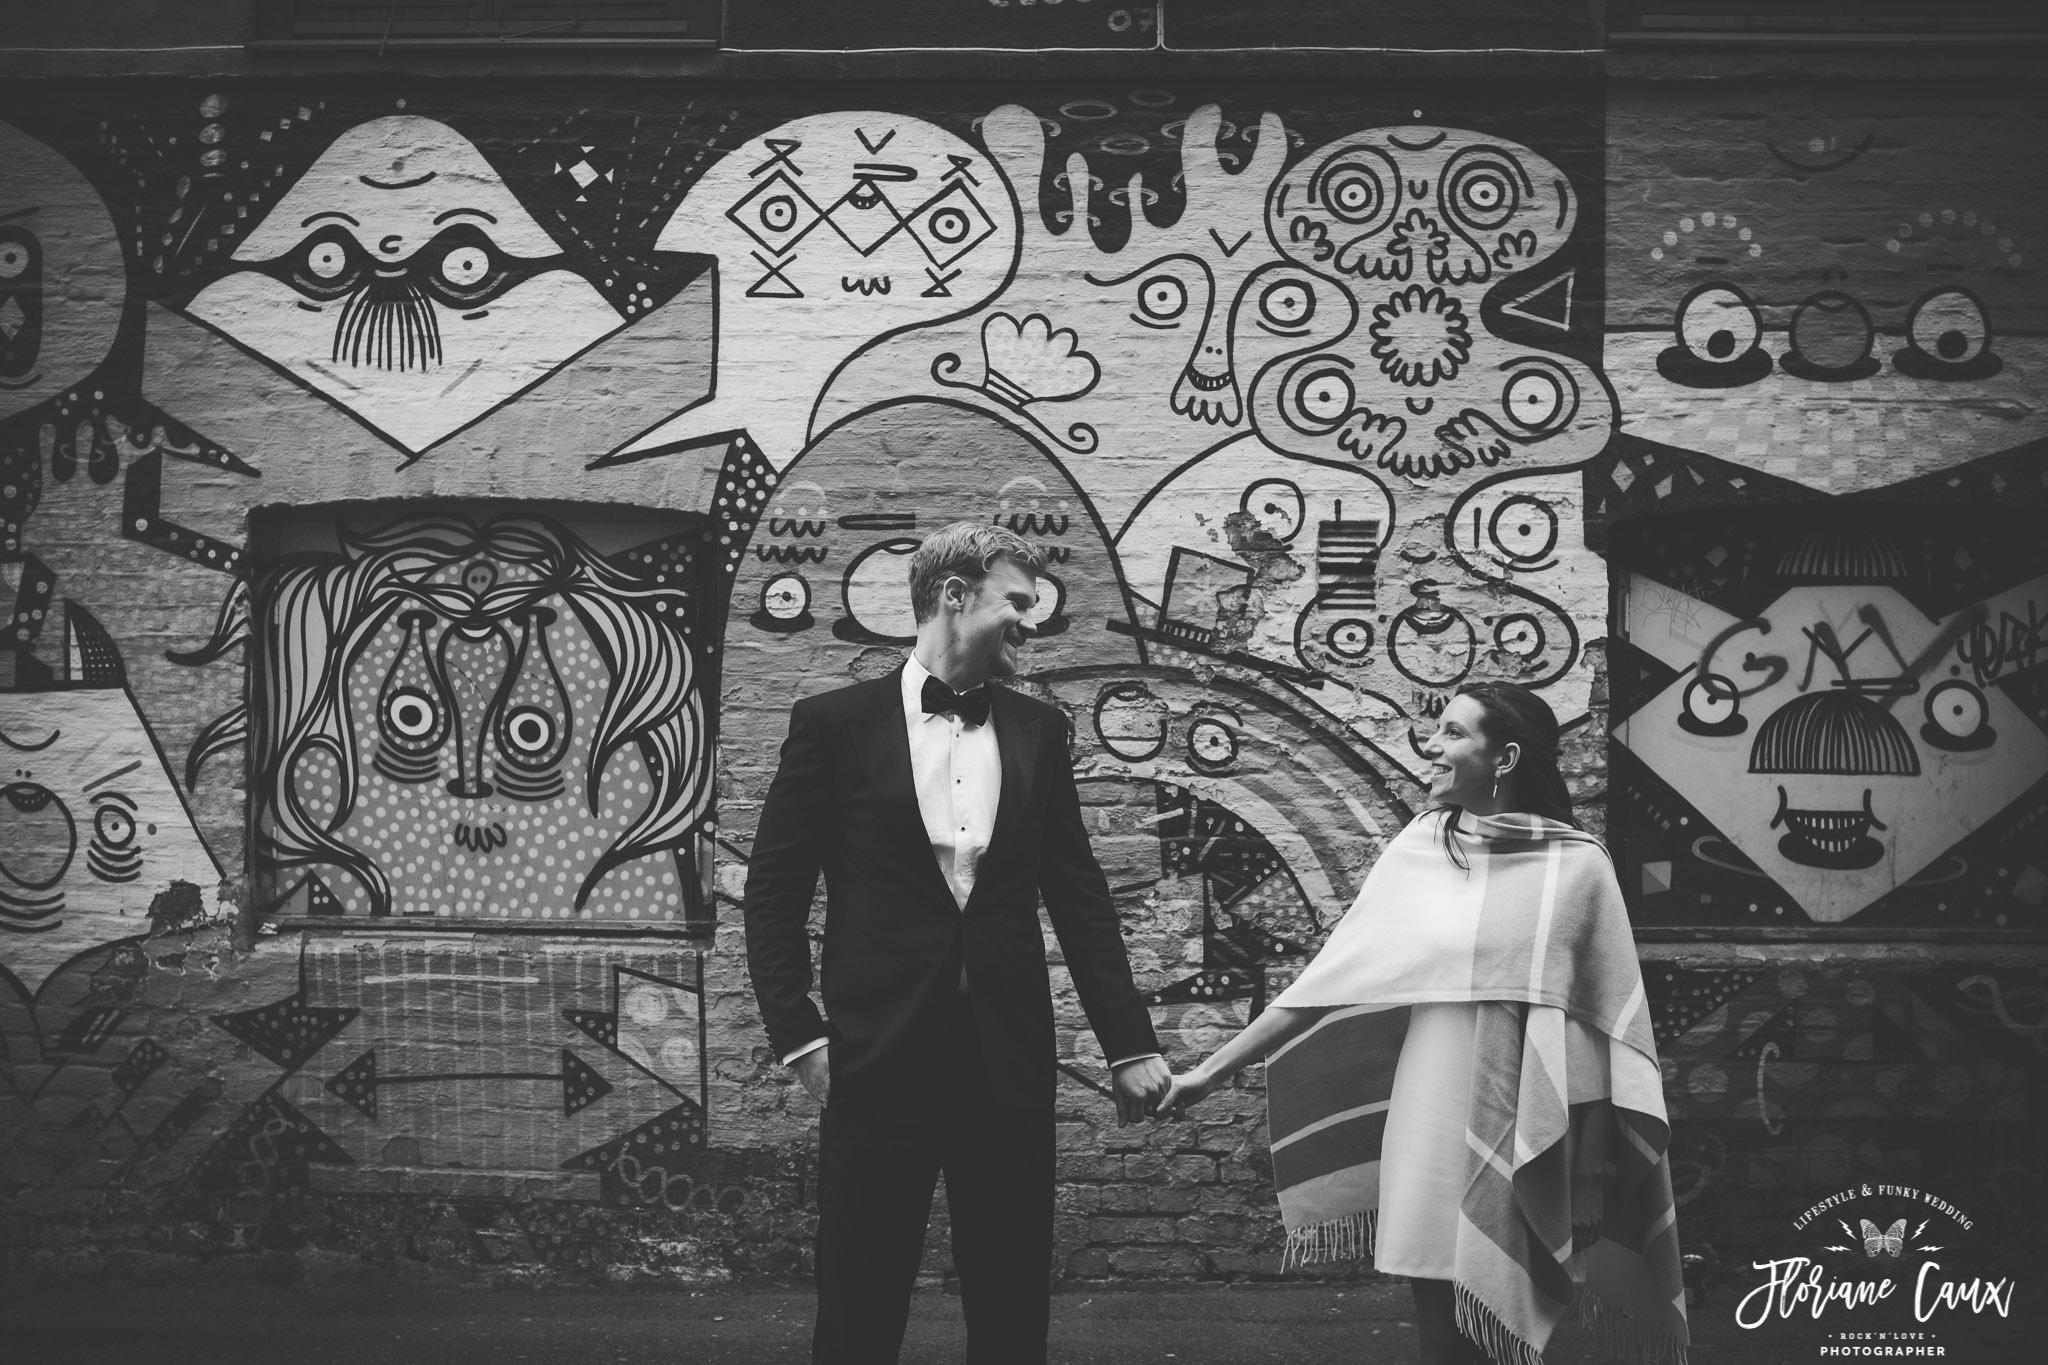 destination-wedding-photographer-oslo-norway-floriane-caux-30